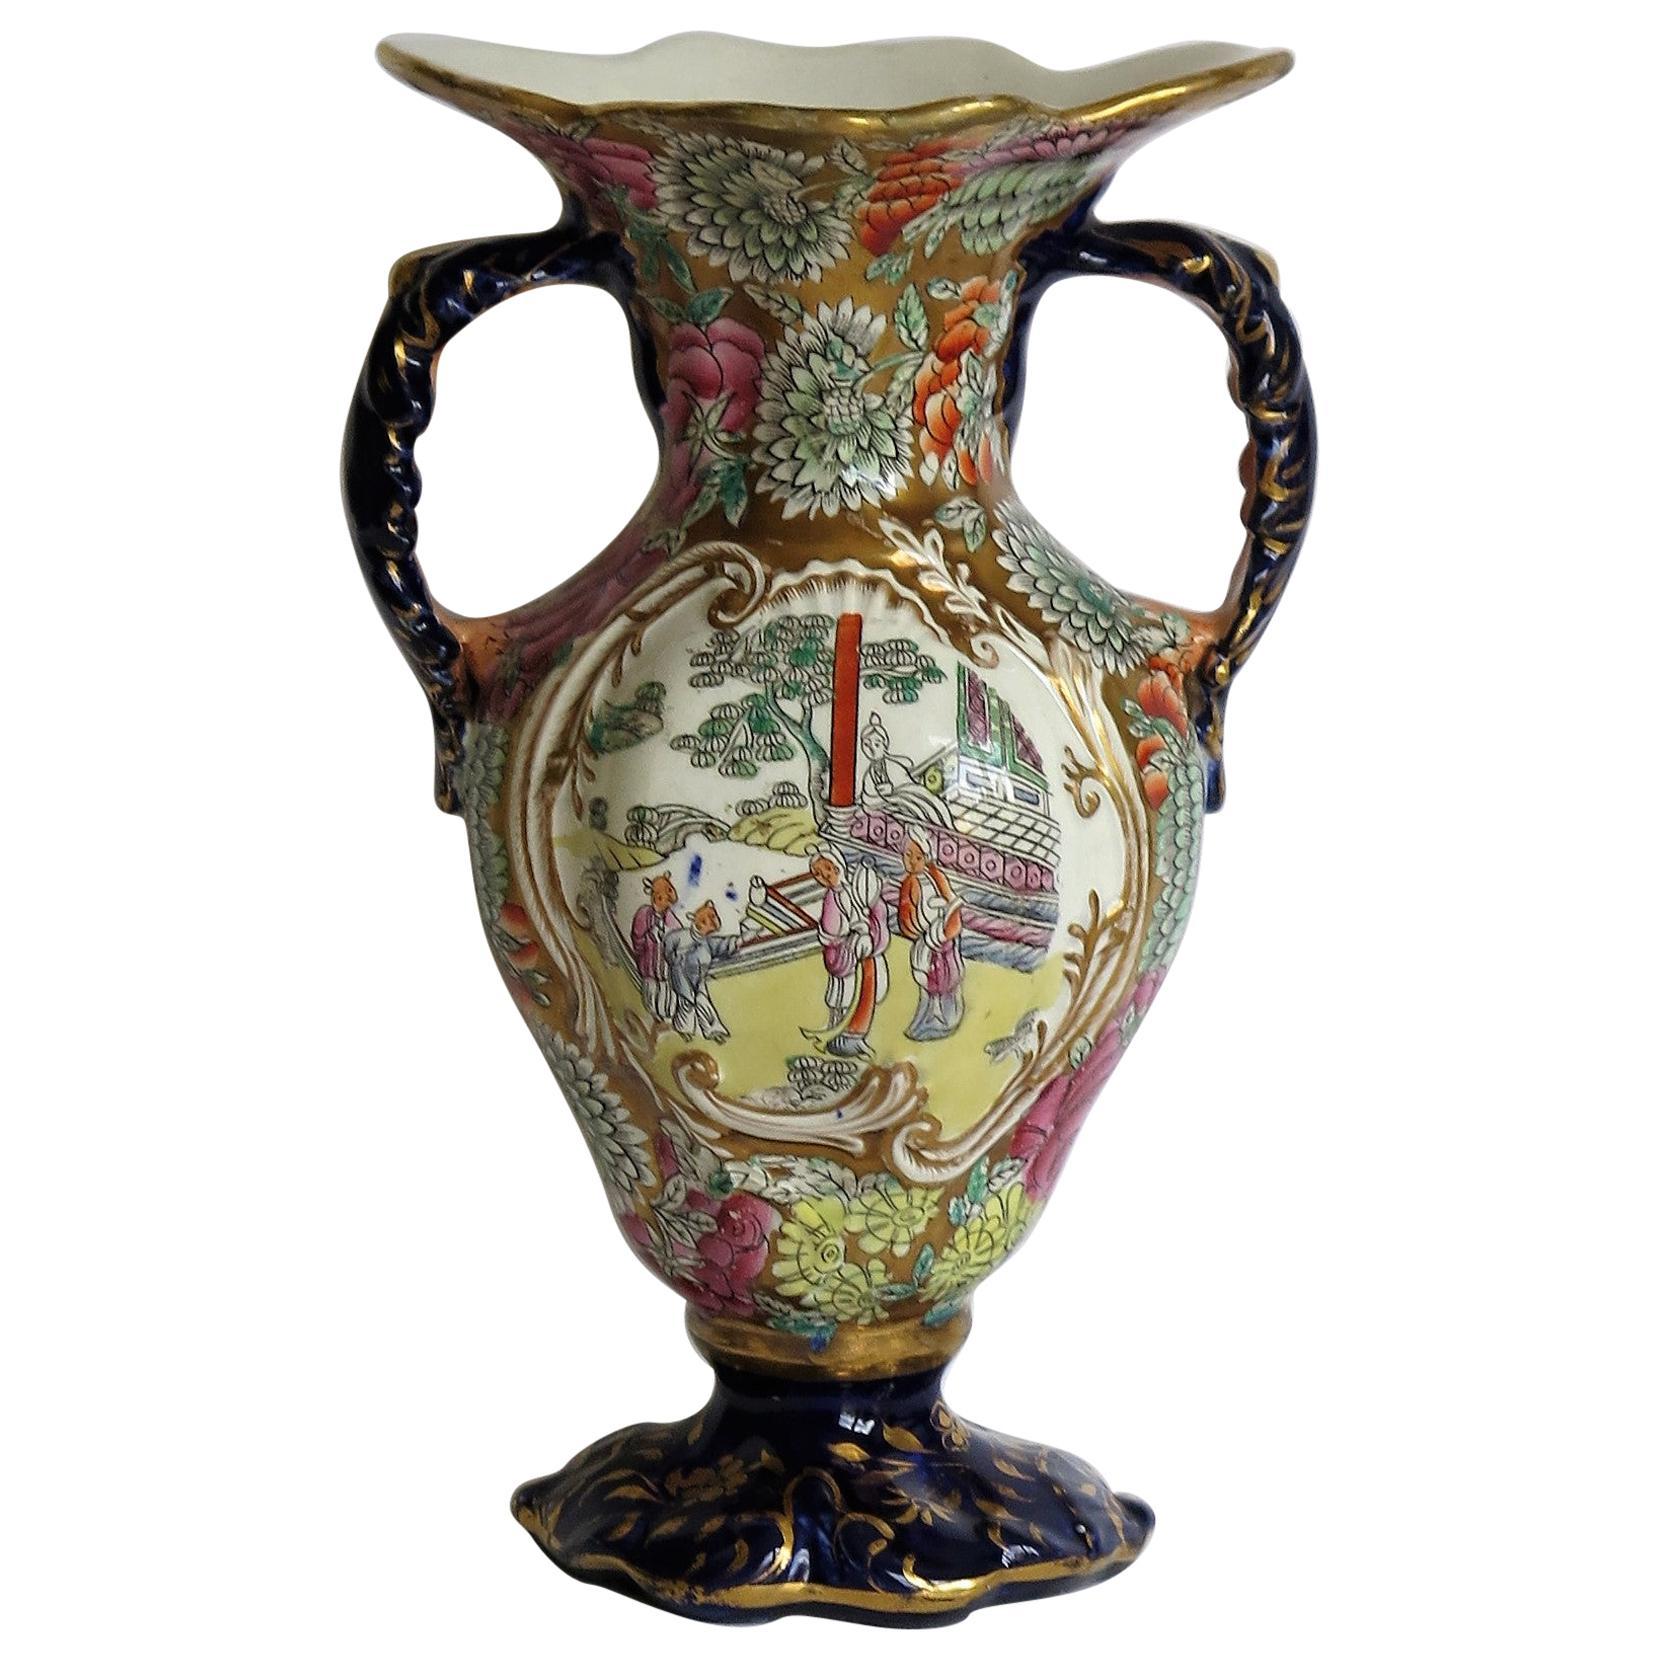 Mason's Ironstone Twin Handled Vase in Chinese Visitors Pattern, circa 1825